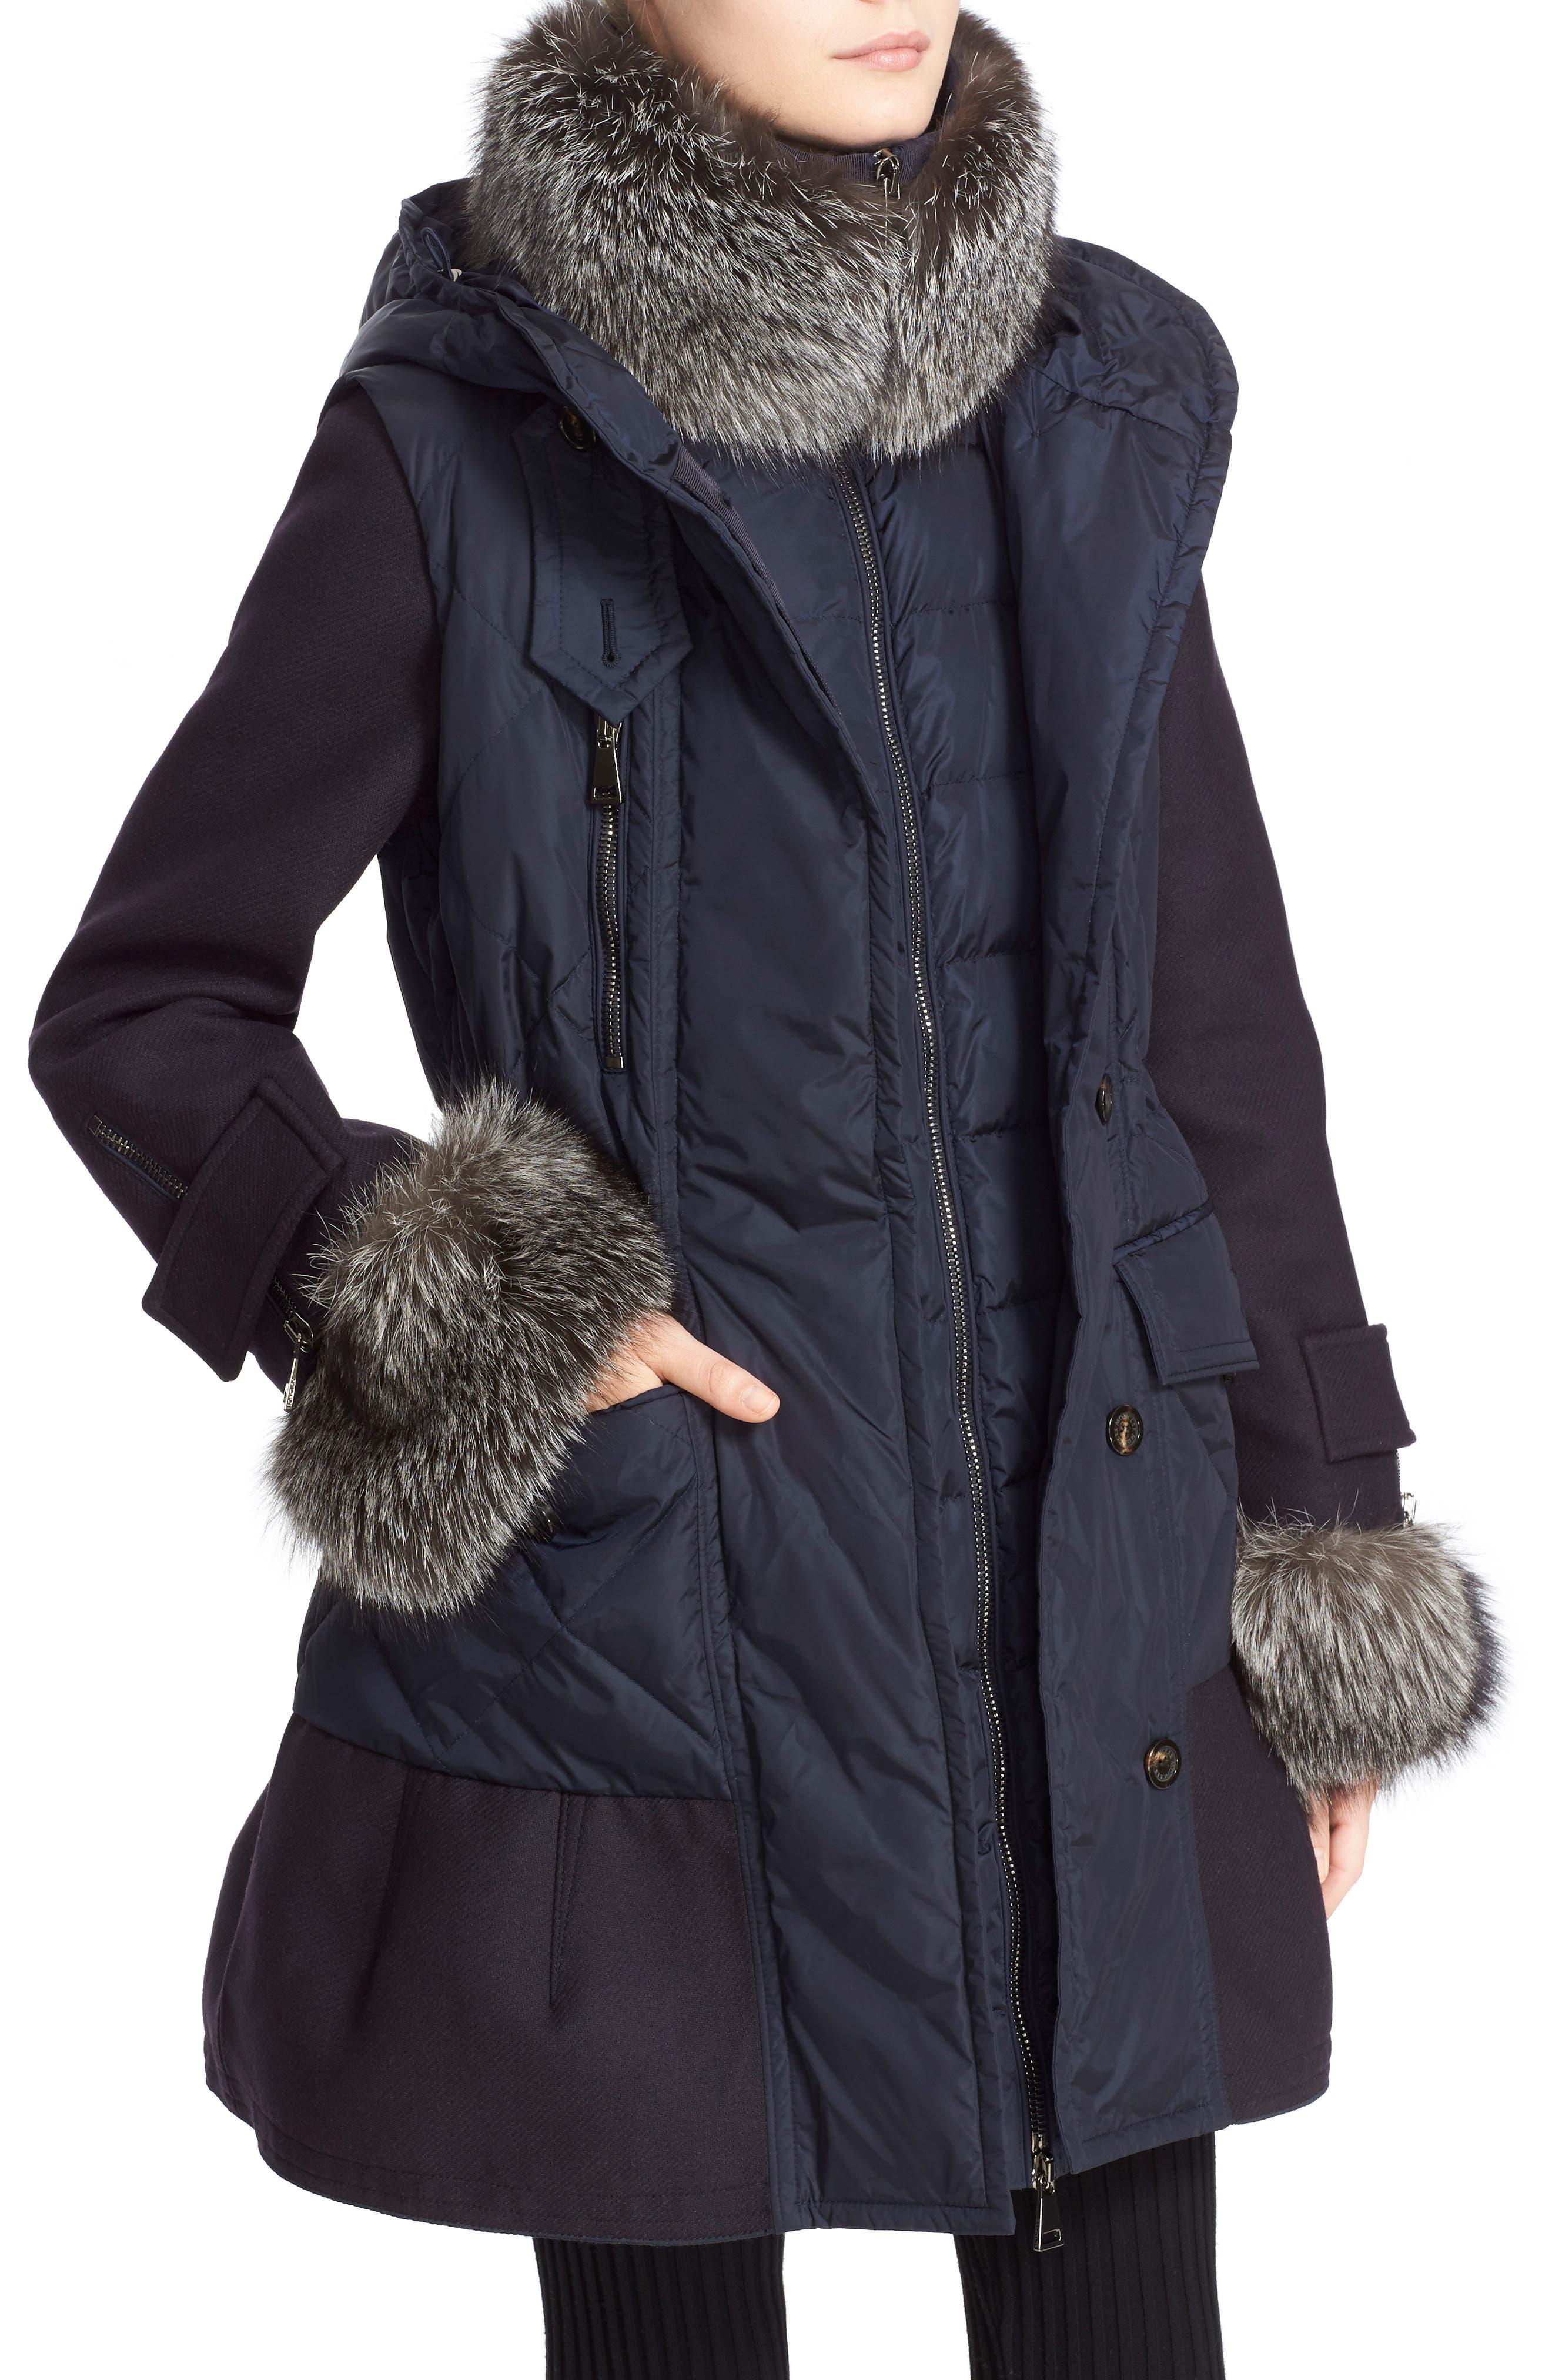 'Elestoria' Two-Piece Down Puffer Coat with Genuine Fox Fur Trim,                             Alternate thumbnail 4, color,                             419